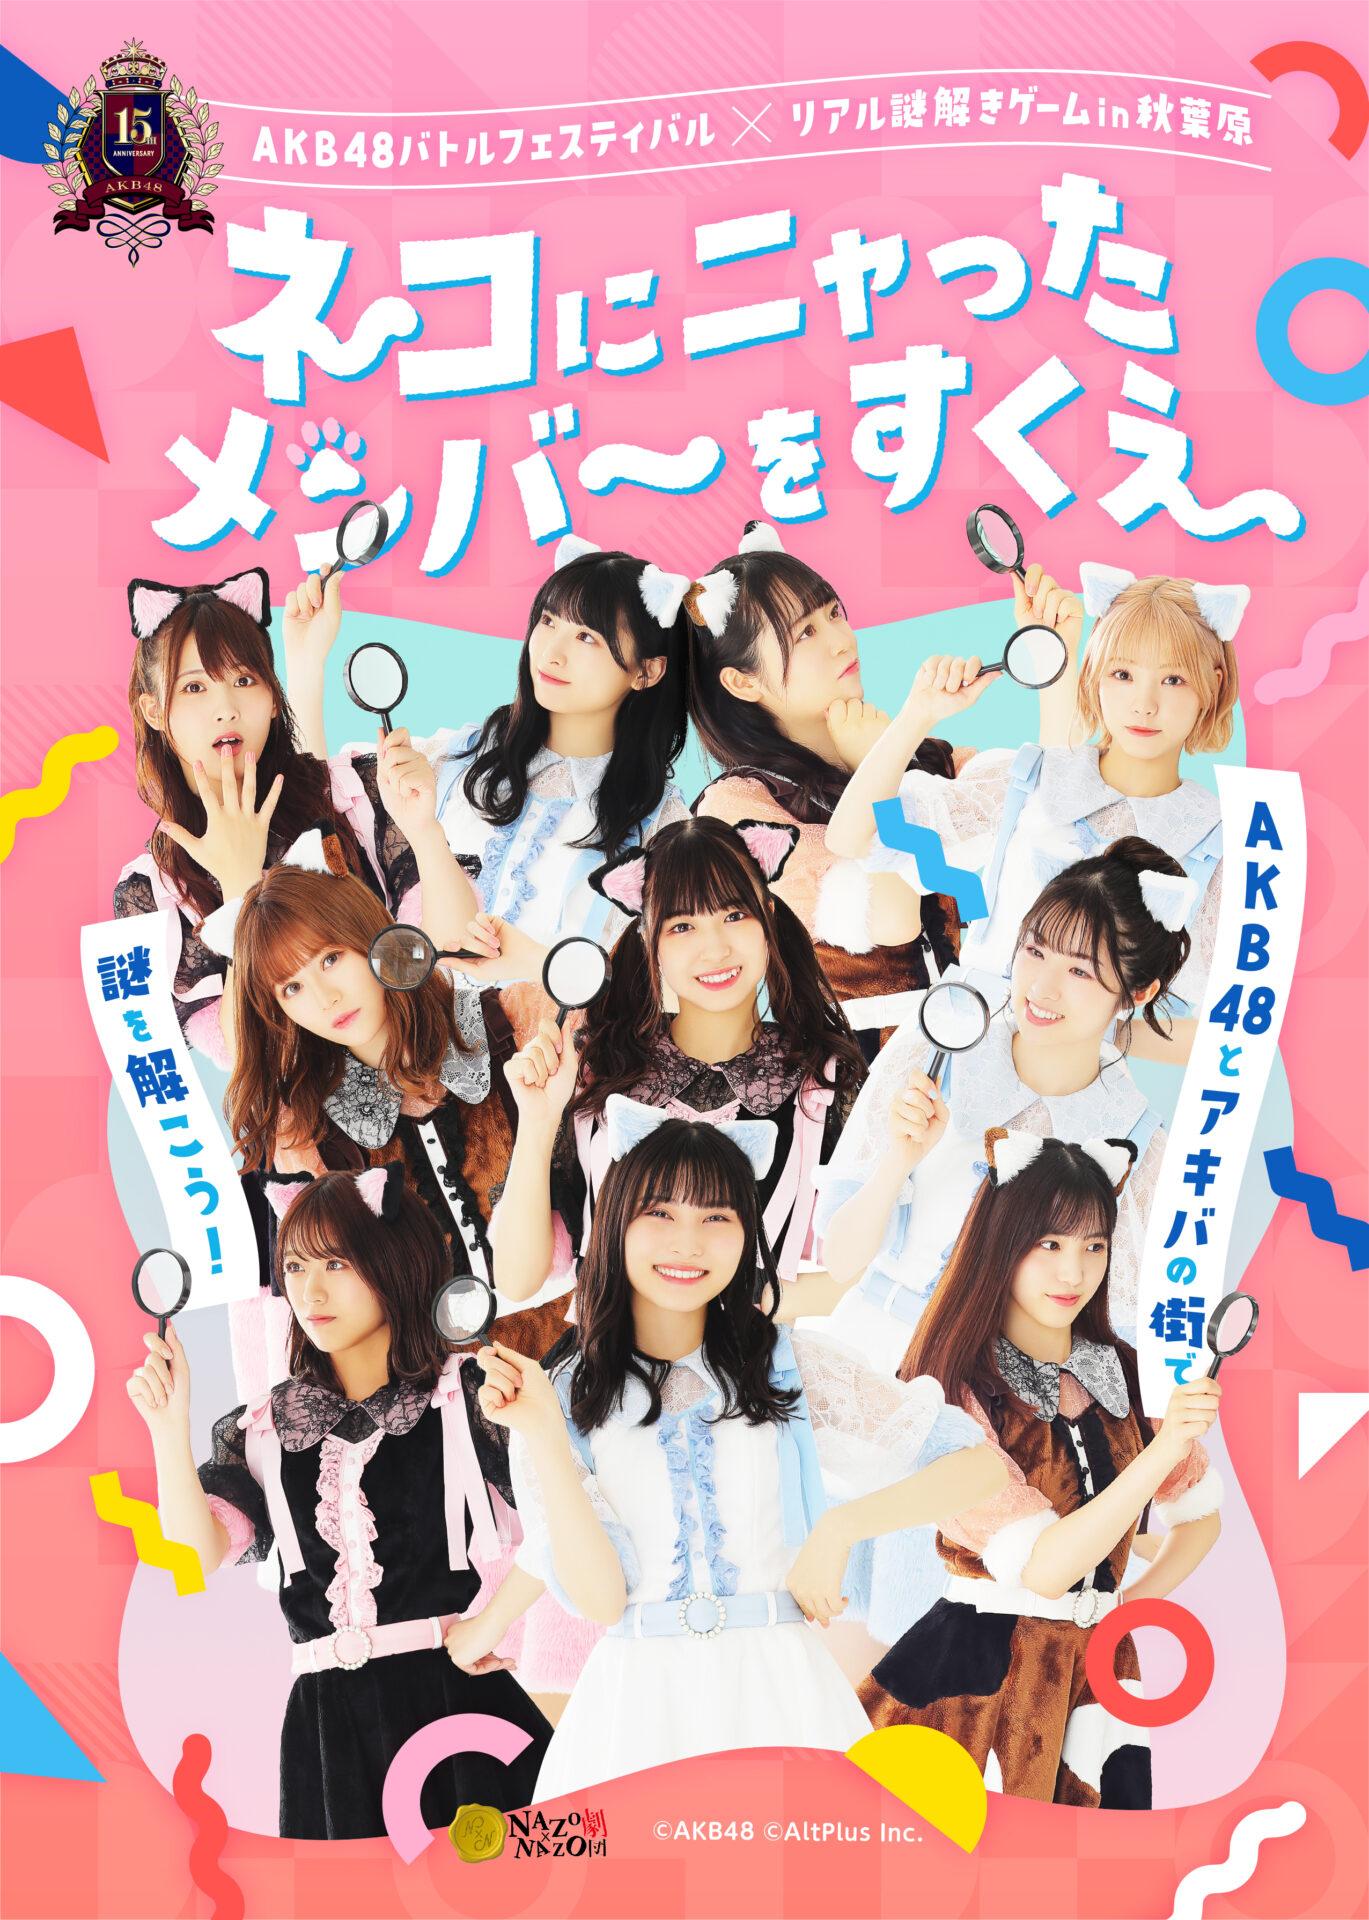 AKB48バトルフェスティバル×リアル謎解きゲーム in 秋葉原〜ネコにニャったメンバーをすくえ〜